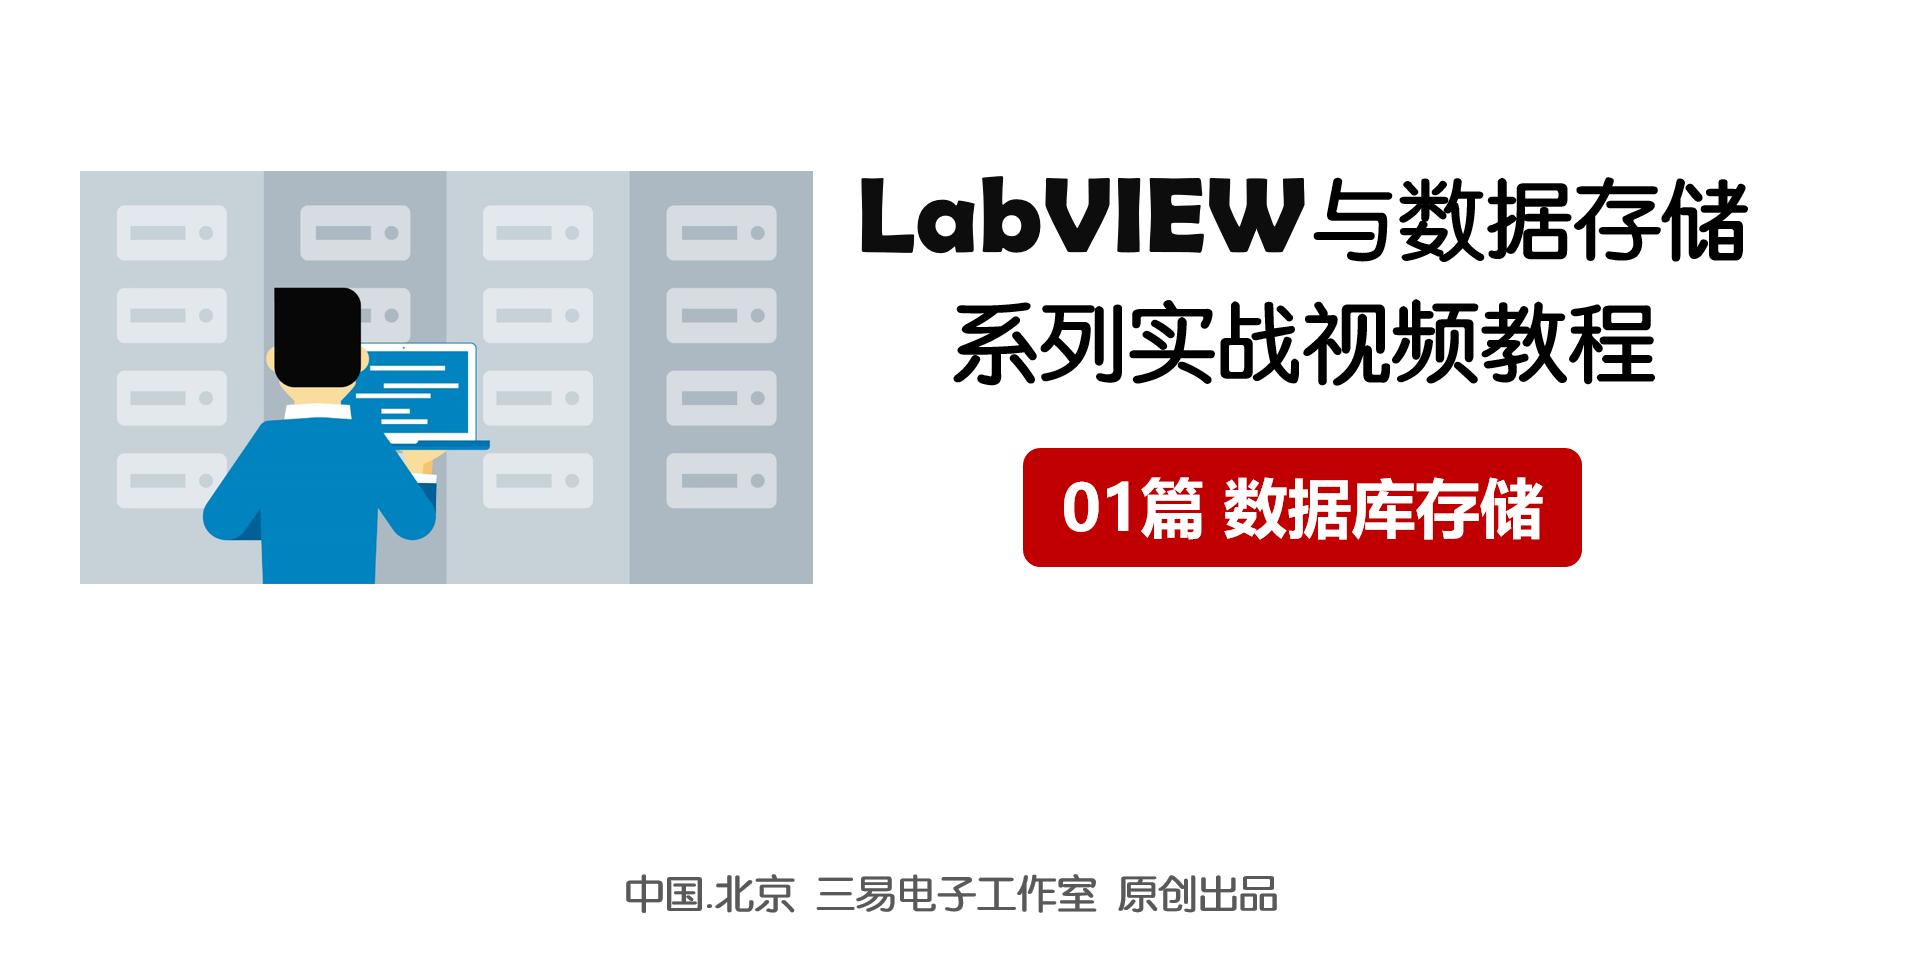 LabVIEW與數據存儲系列實戰視頻教程【第1篇 數據庫存儲】